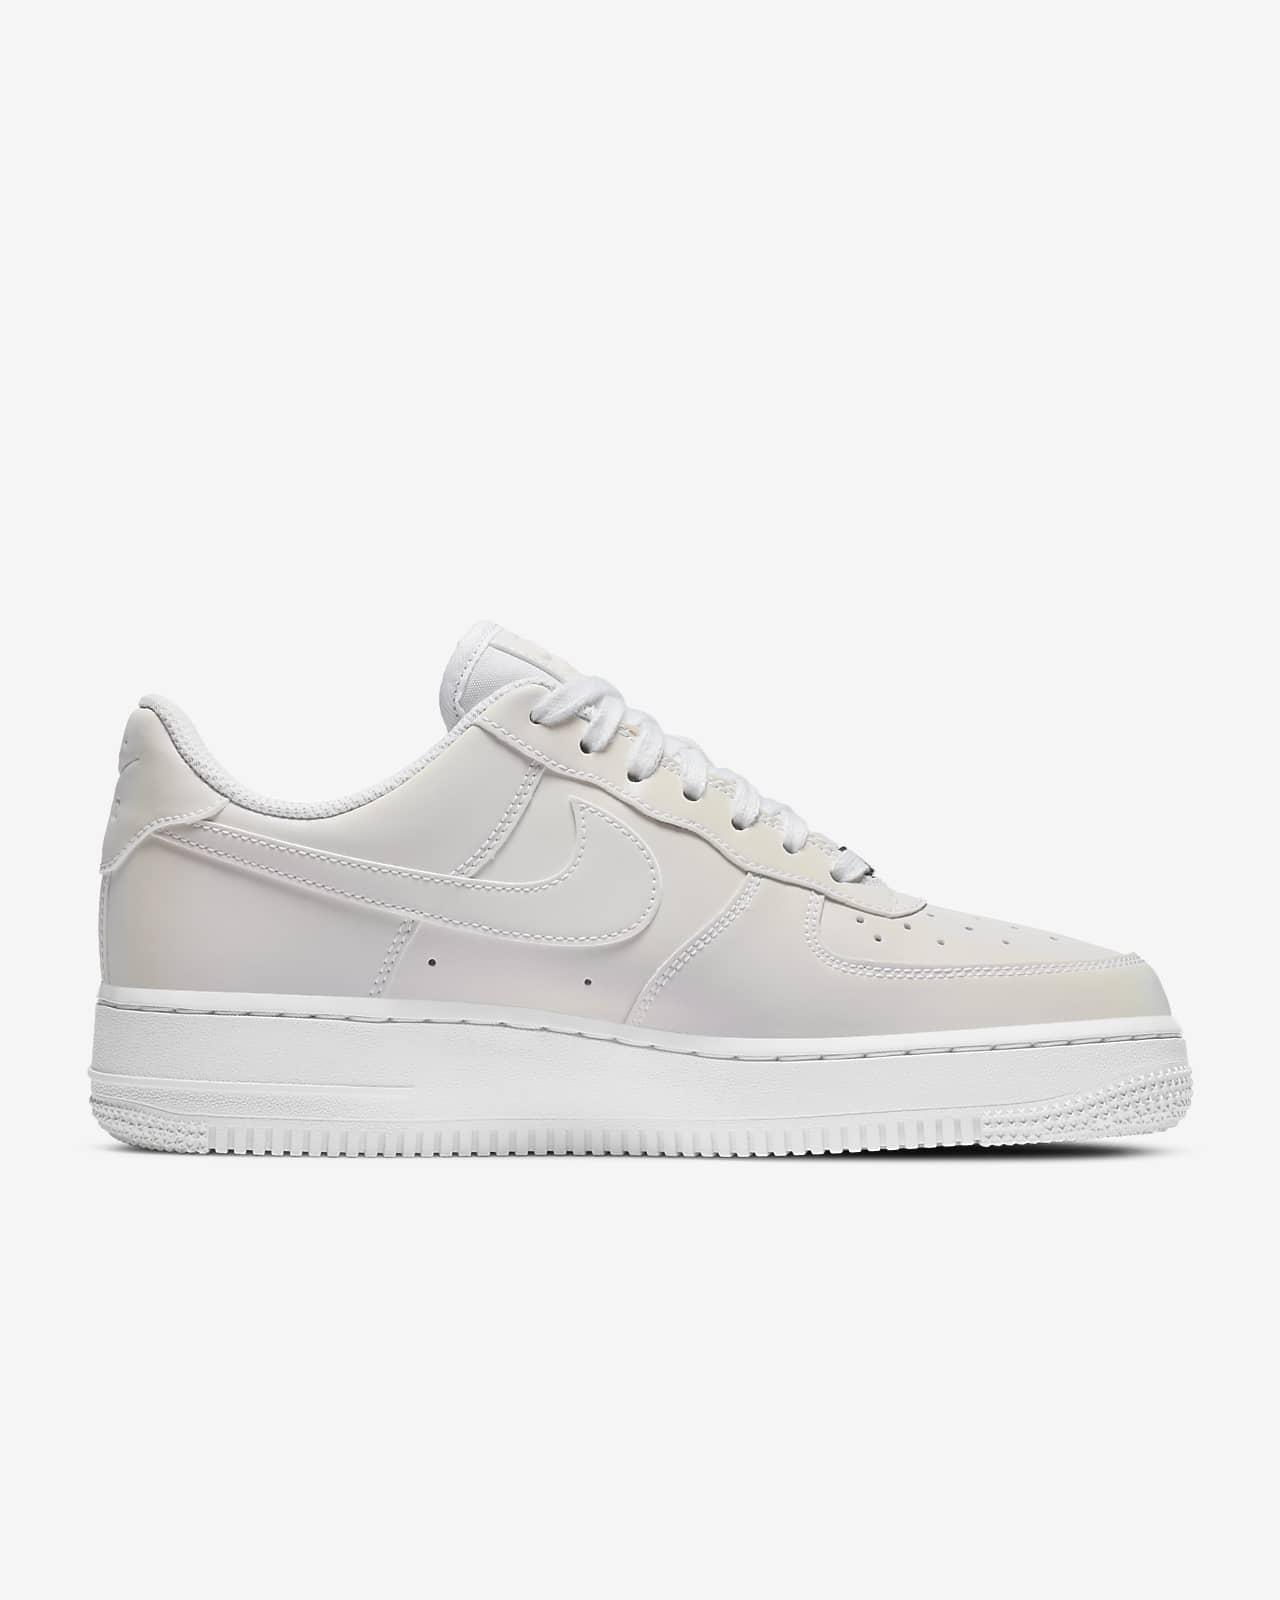 Excelente Cortar Duplicación  Nike Air Force 1 '07 Women's Shoe. Nike.com